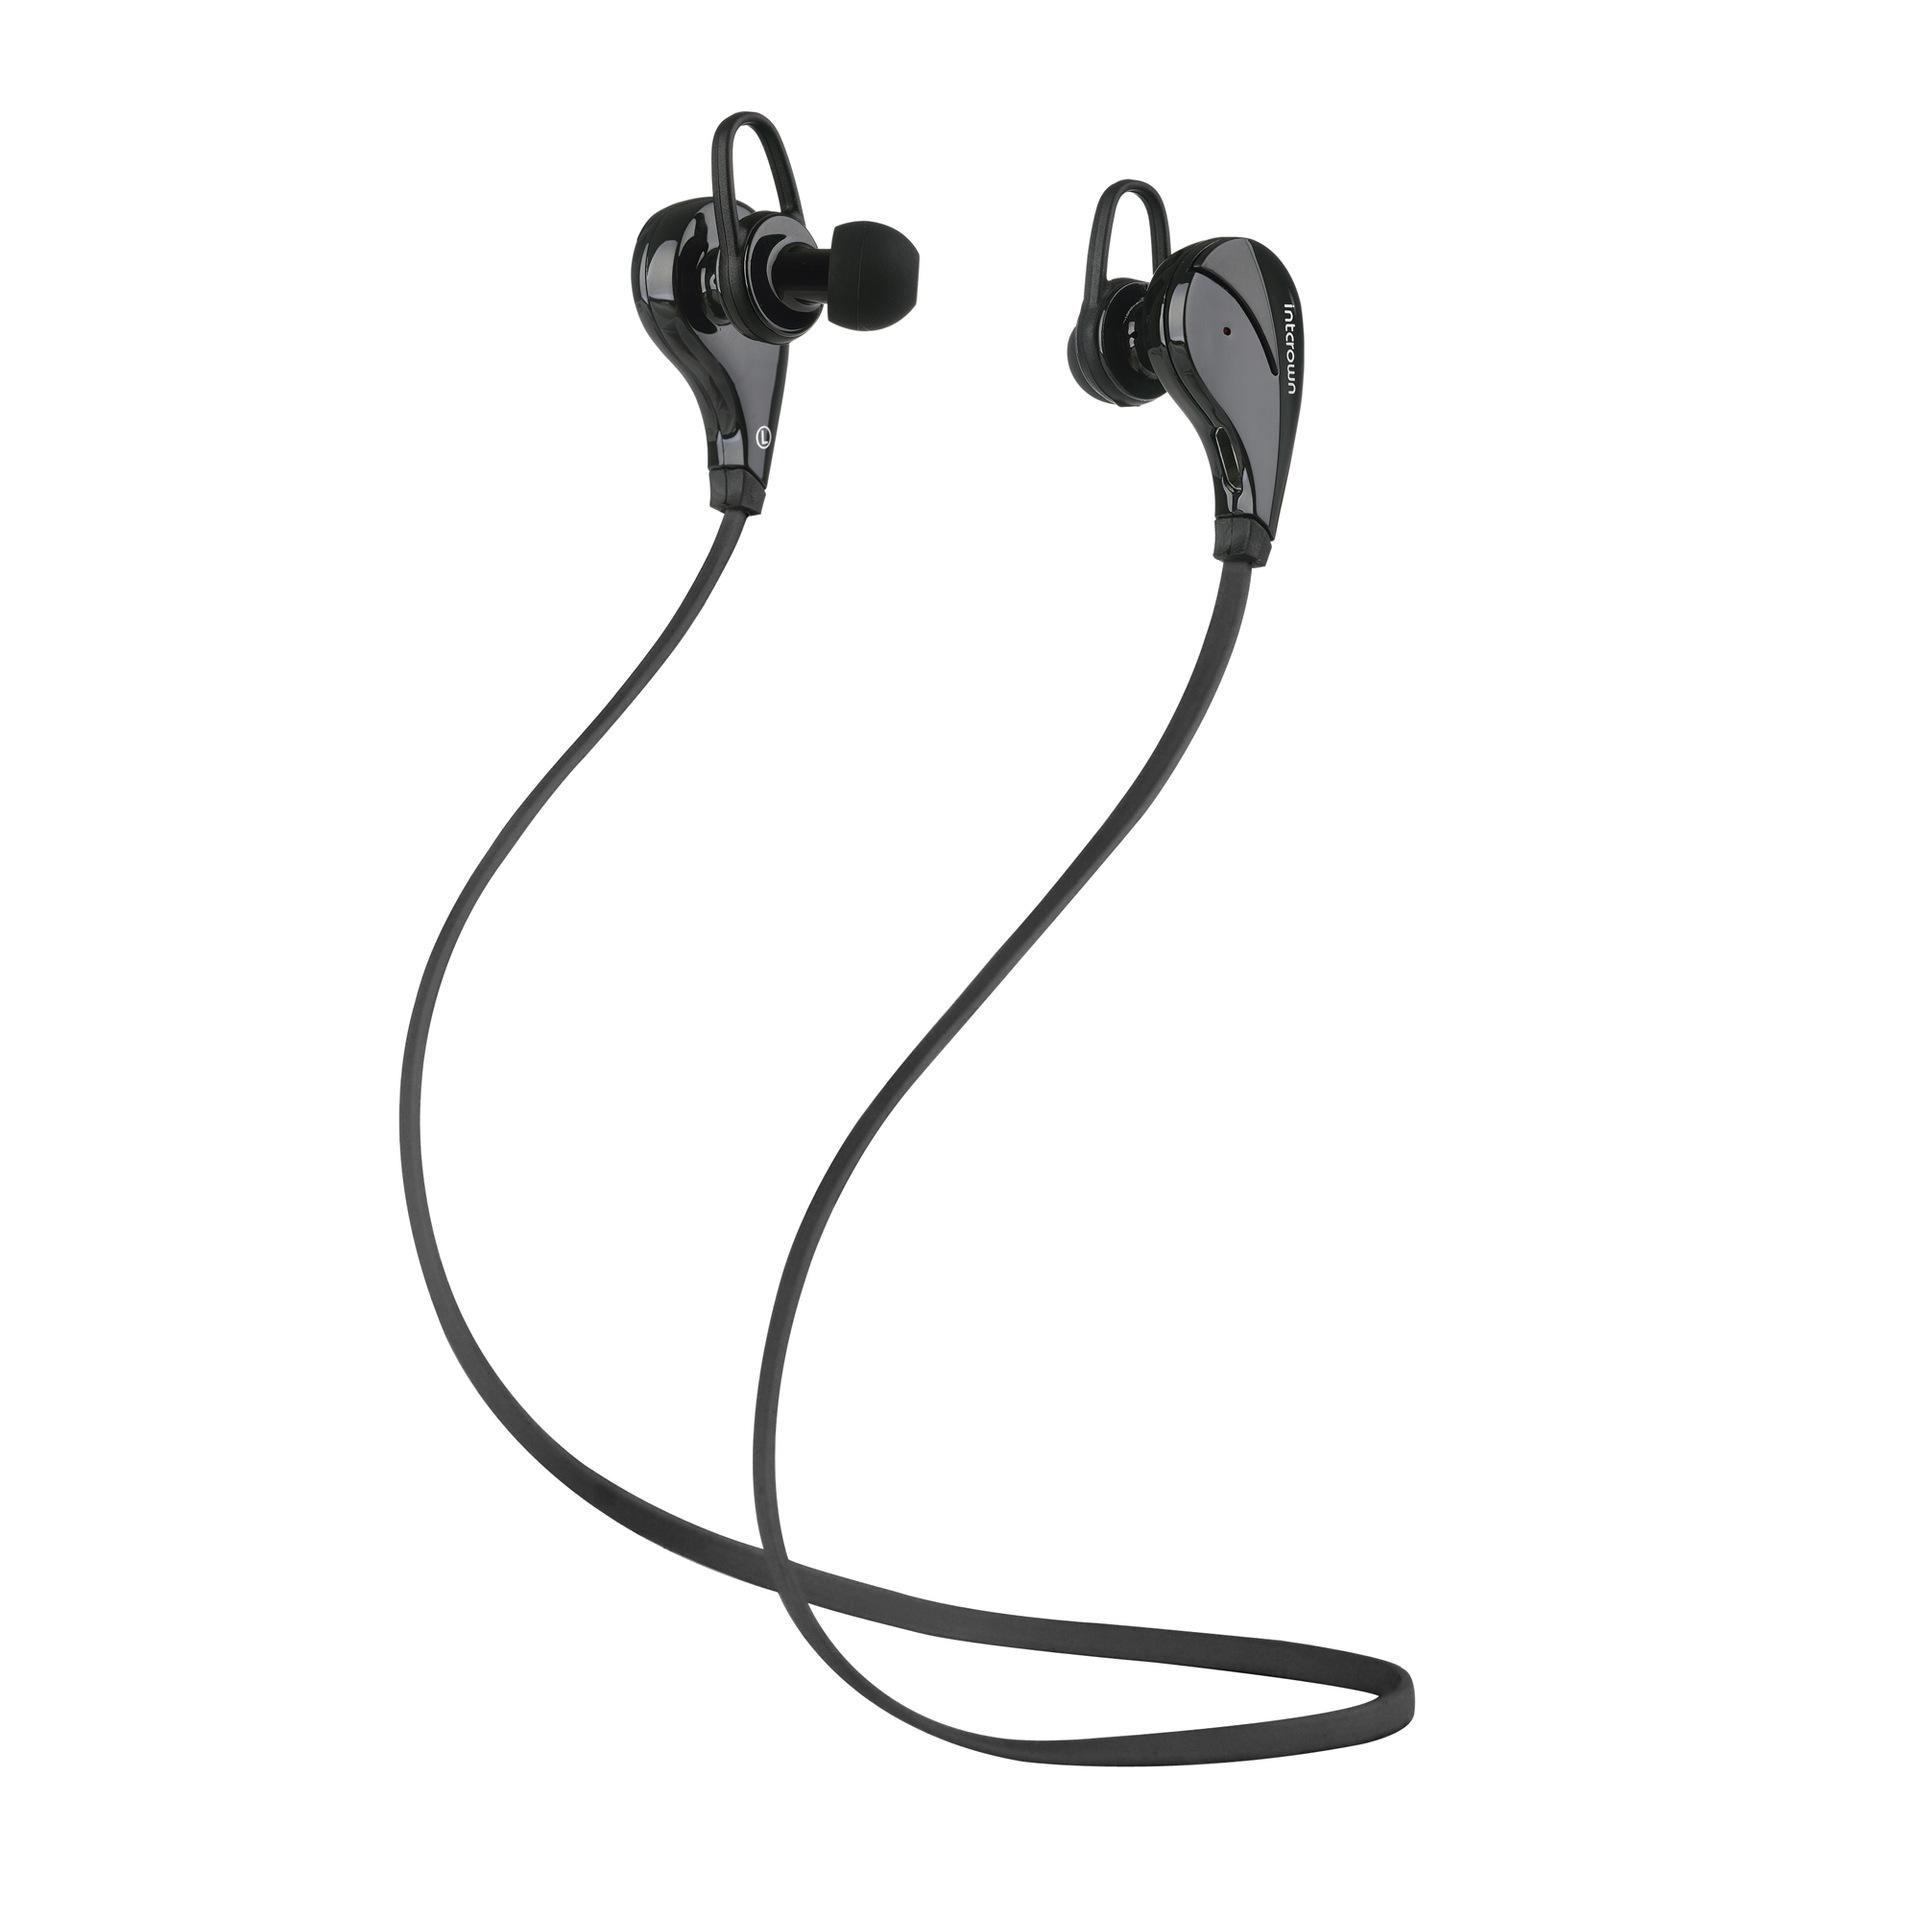 G6 Earphone Headphone Wireless Sport Running Bluetooth Headset Stereo Earplugs with Microphone for iPhone HTC(China (Mainland))